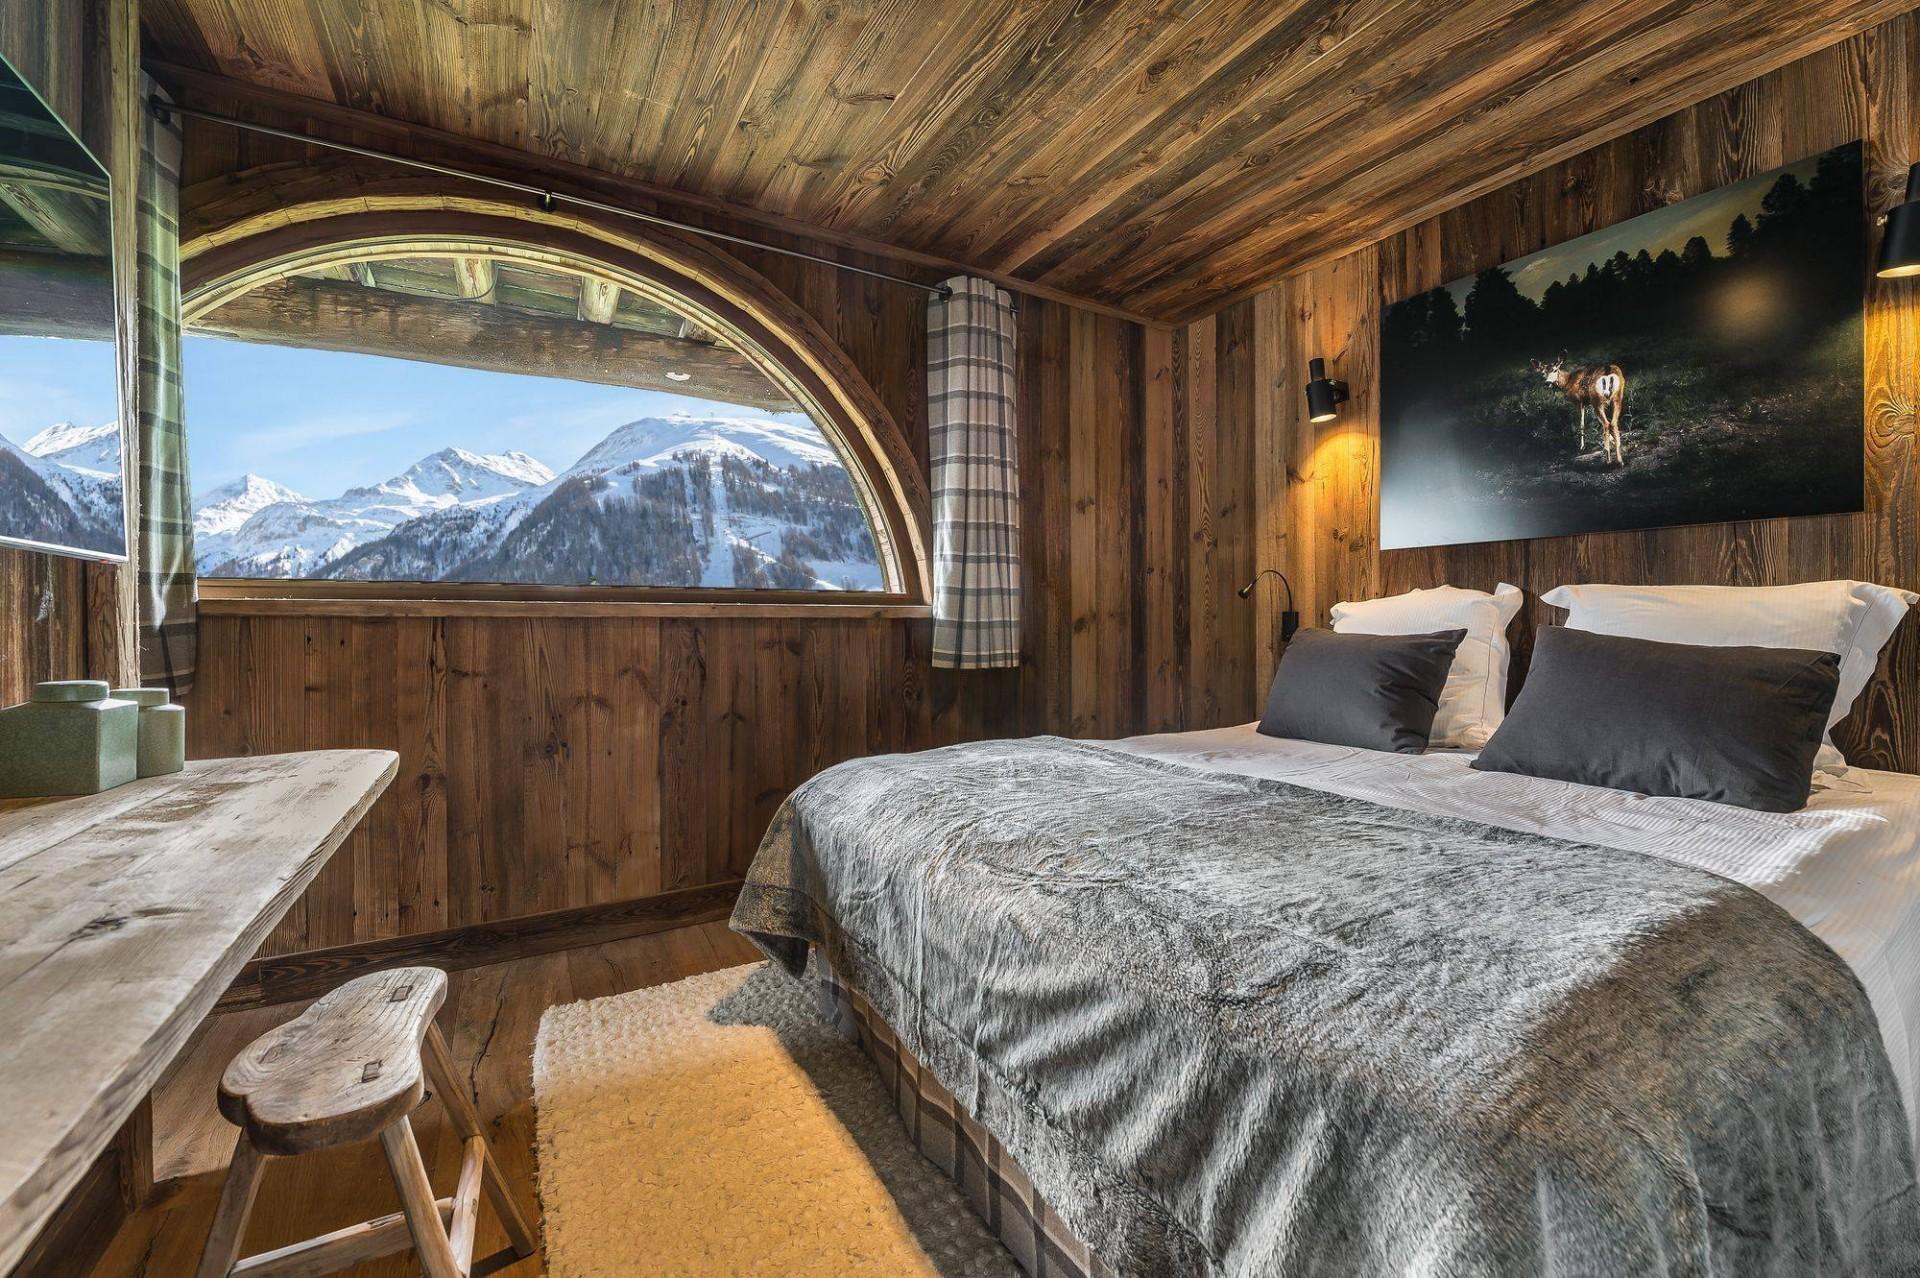 Val d'Isère Location Chalet Luxe Uralelite Chambre